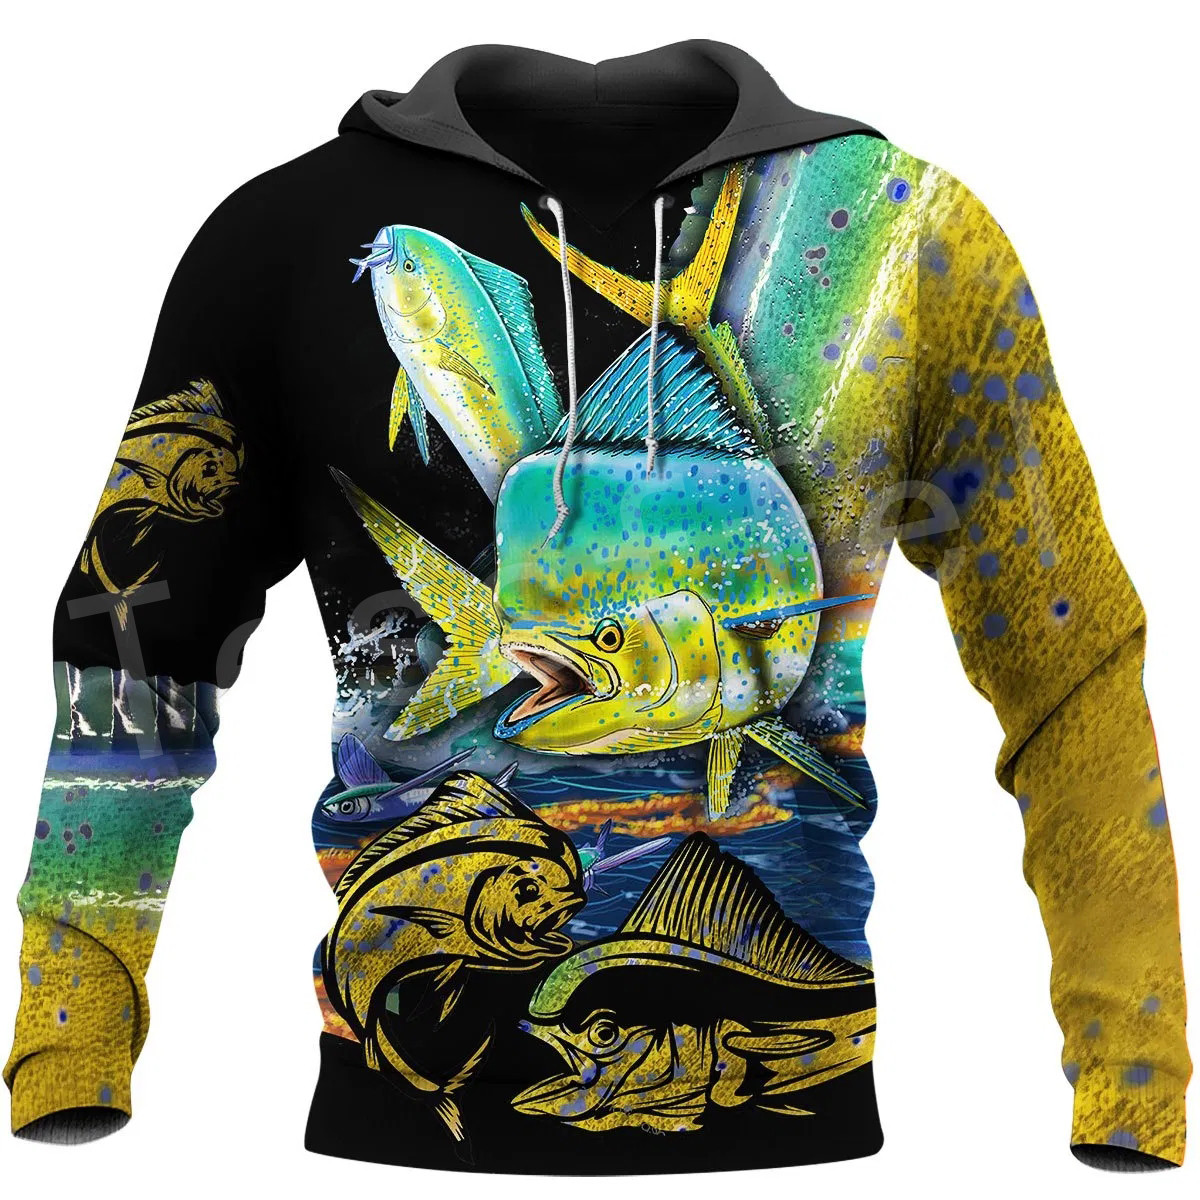 Tessffel New Fashion Animal Camo Bass Fishing Fisher Tracksuit Harajuku Unisex 3DPrinted Zipper/Hoodies/Sweatshirts/Jacket s-16